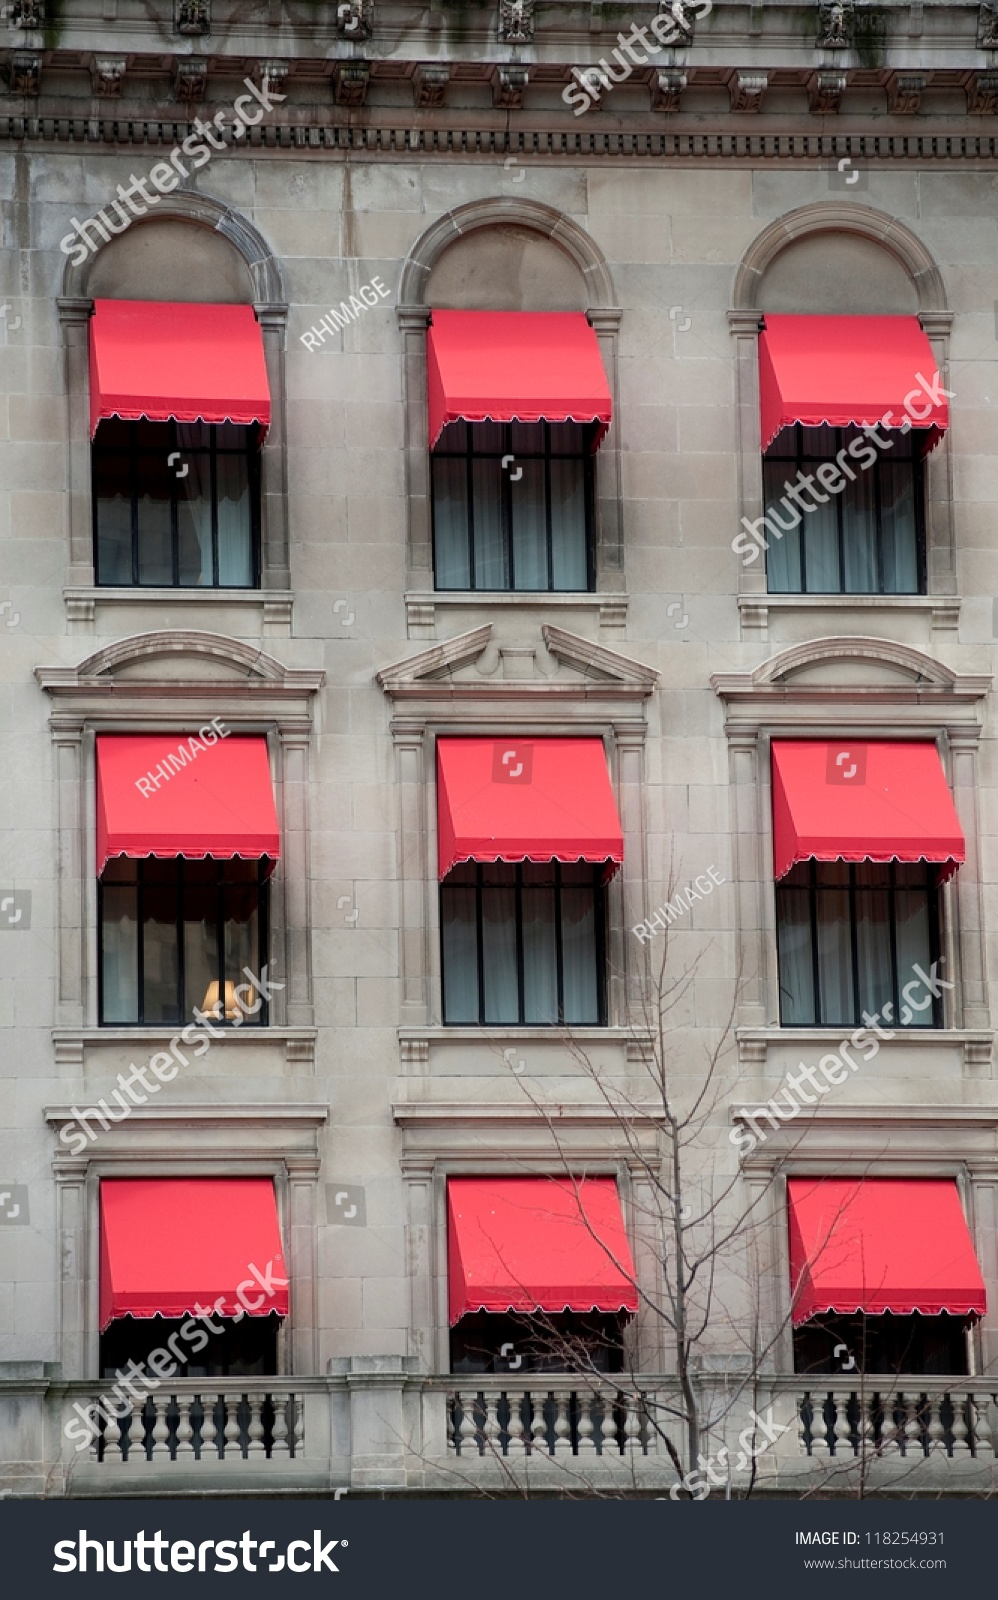 red awnings on building boston massachusetts stock photo 118254931